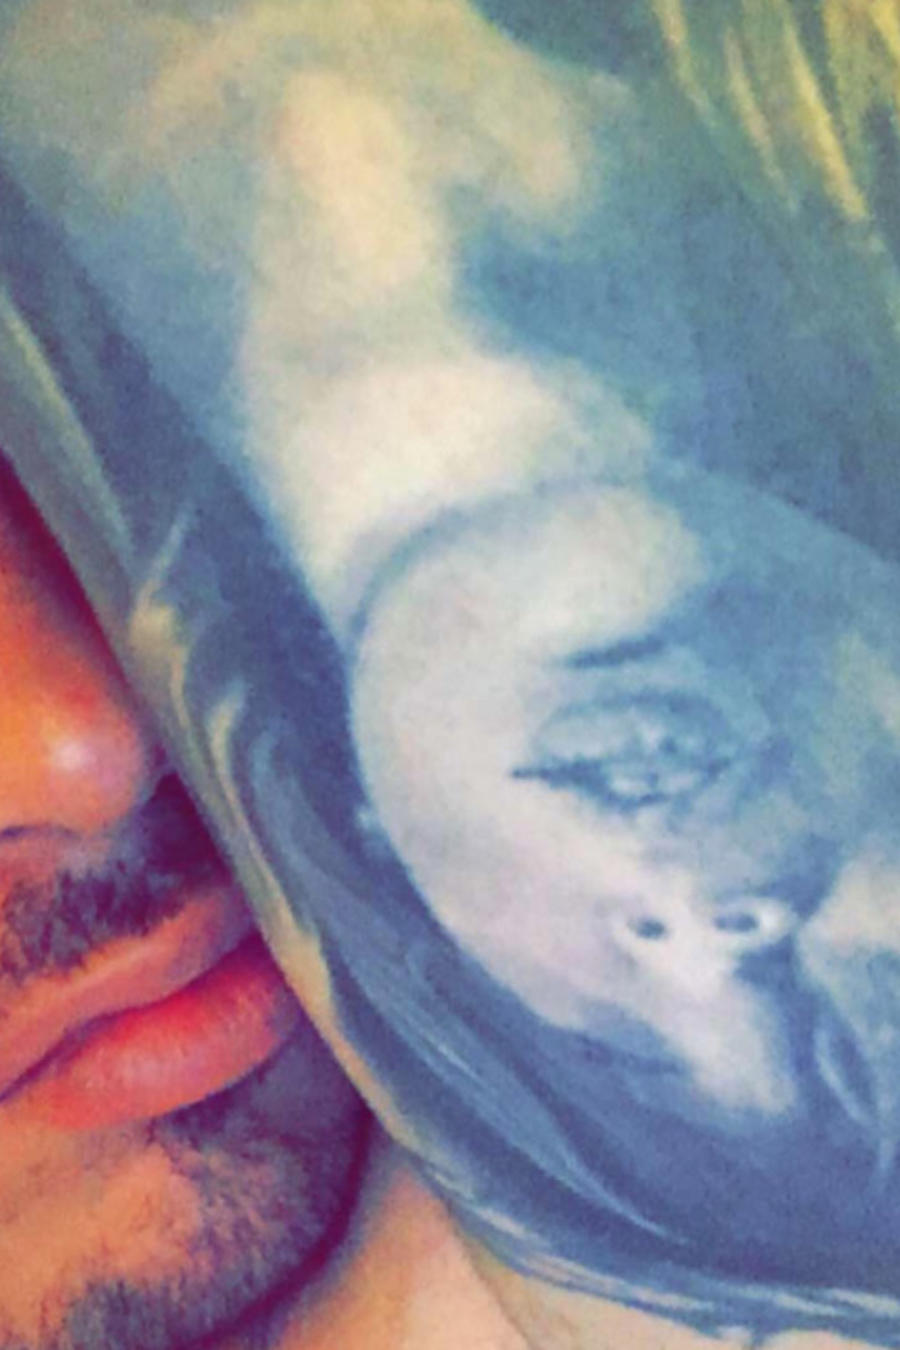 jbalvin muestra tatuaje